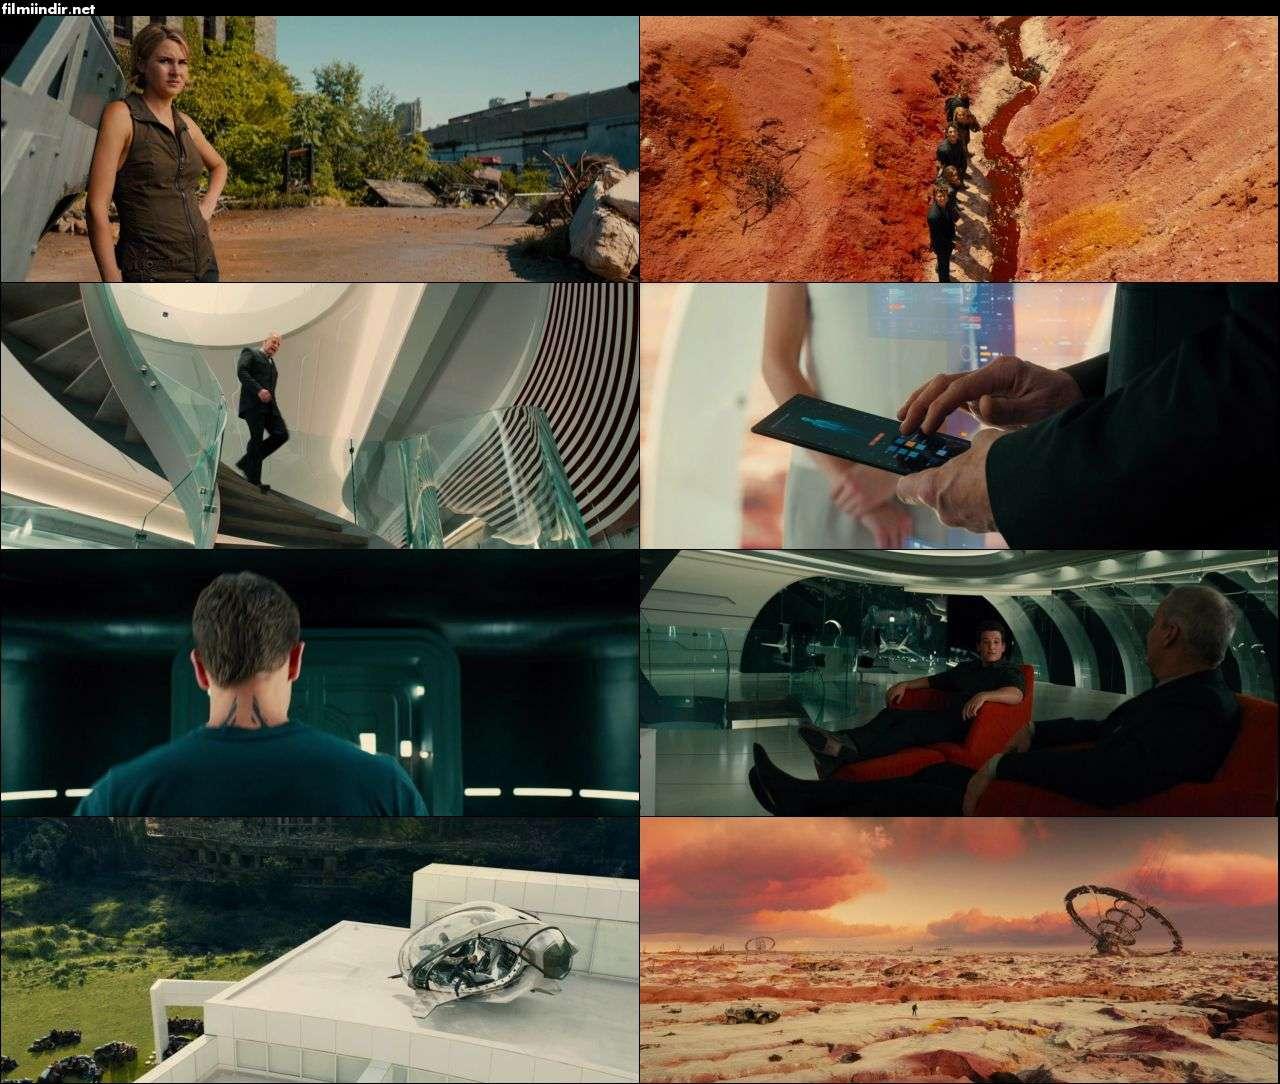 Uyumsuz Serisi: Yandaş - The Divergent Series: Allegiant (2016) türkçe dublaj film indir